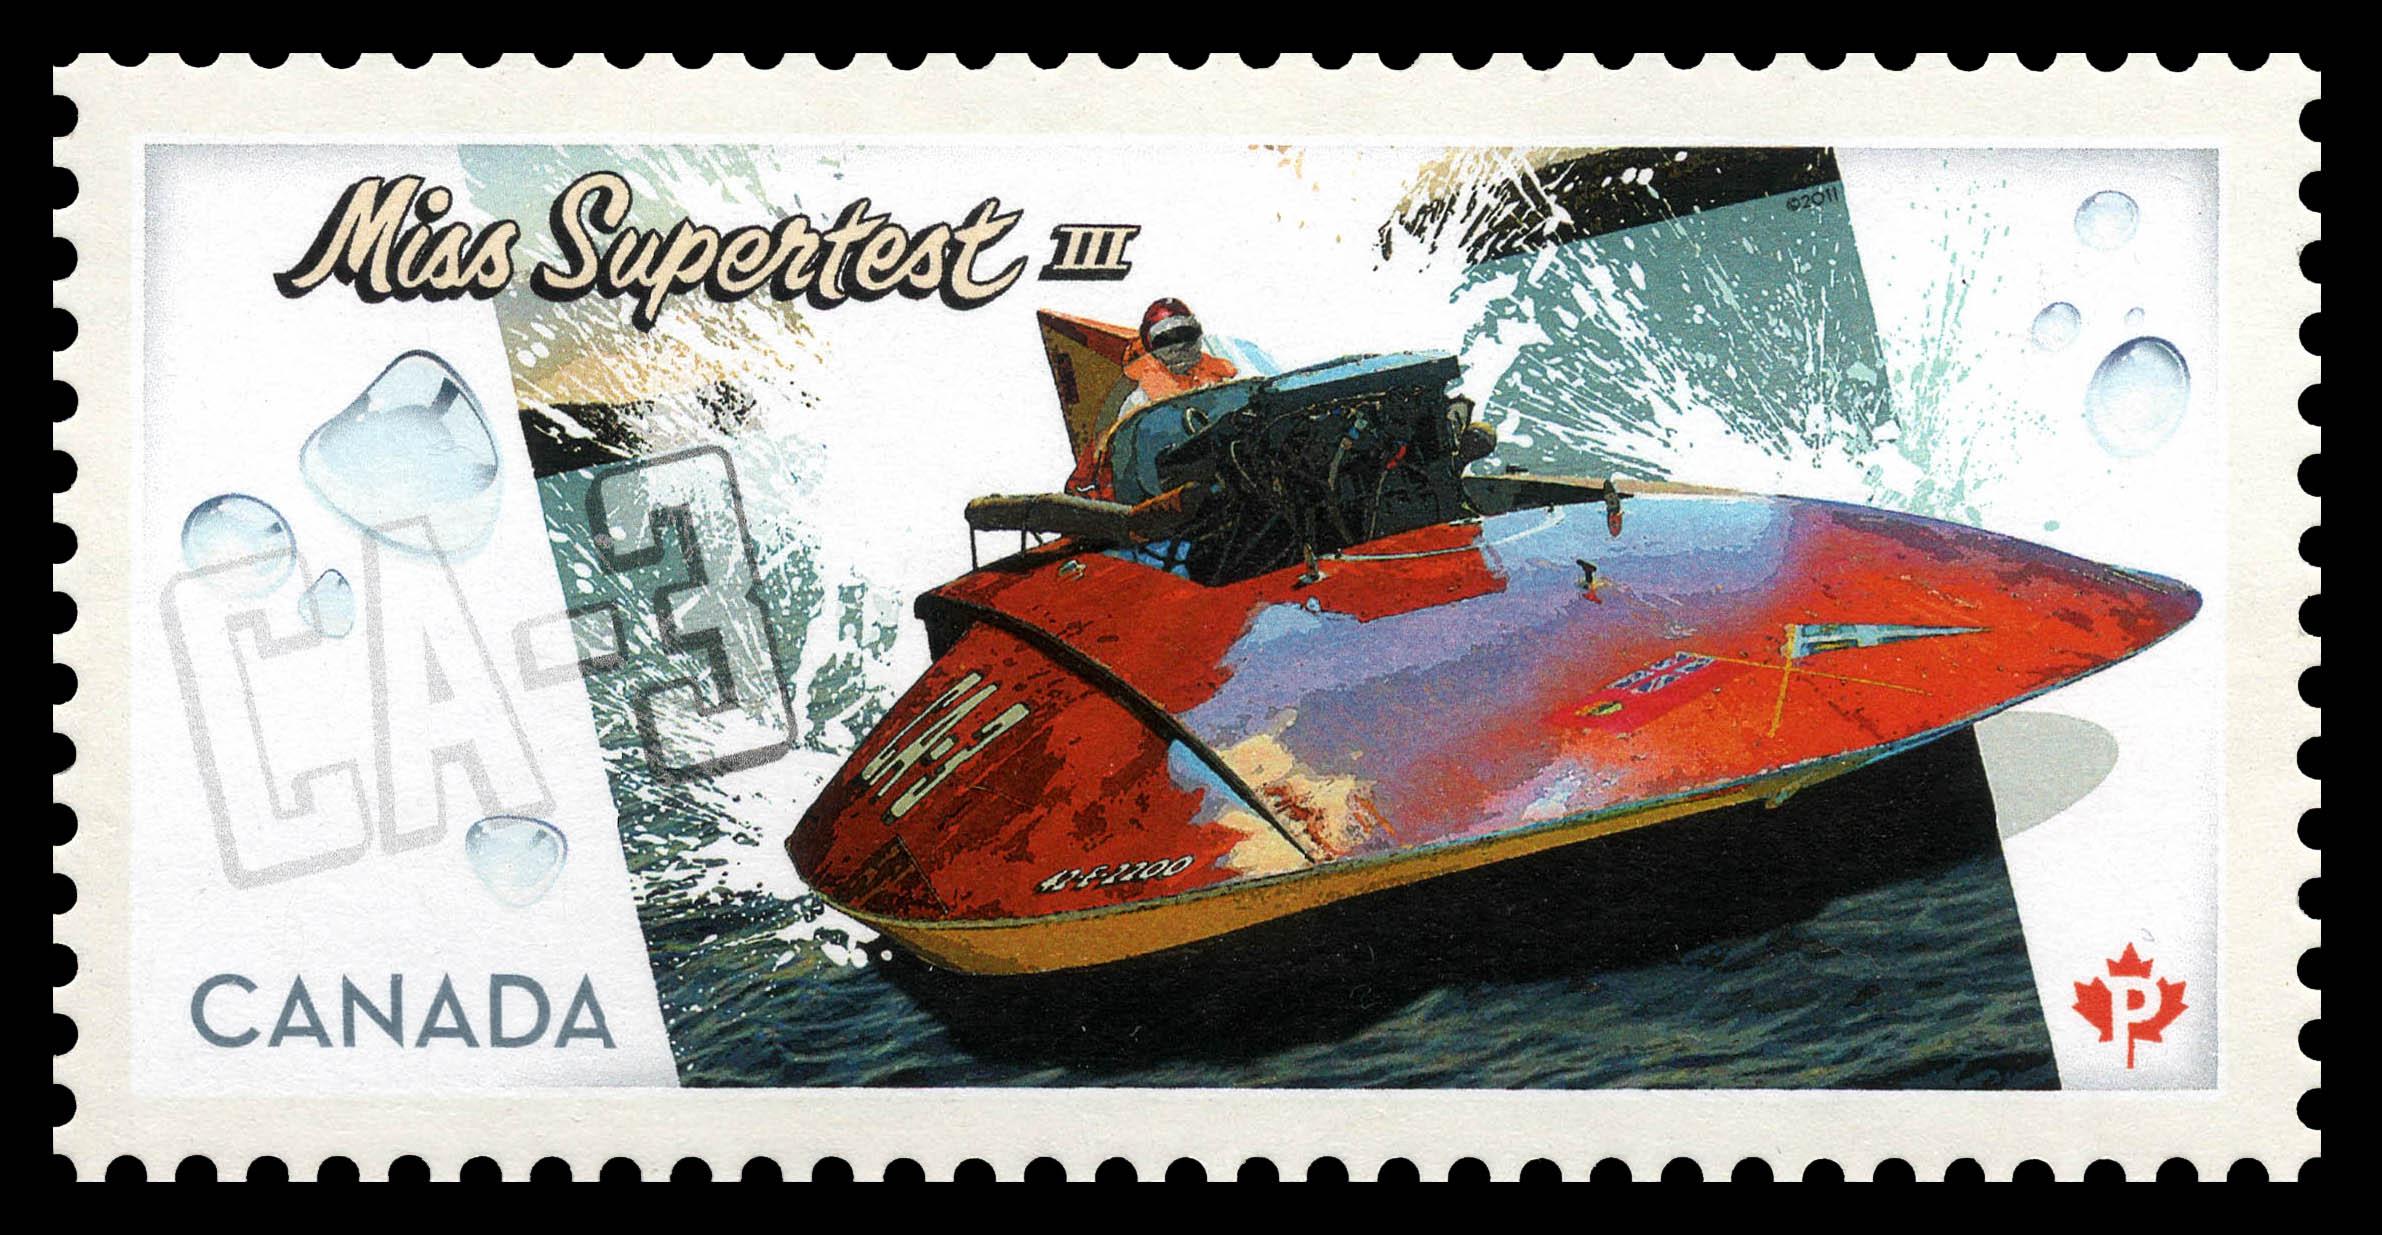 Miss Supertest III Canada Postage Stamp